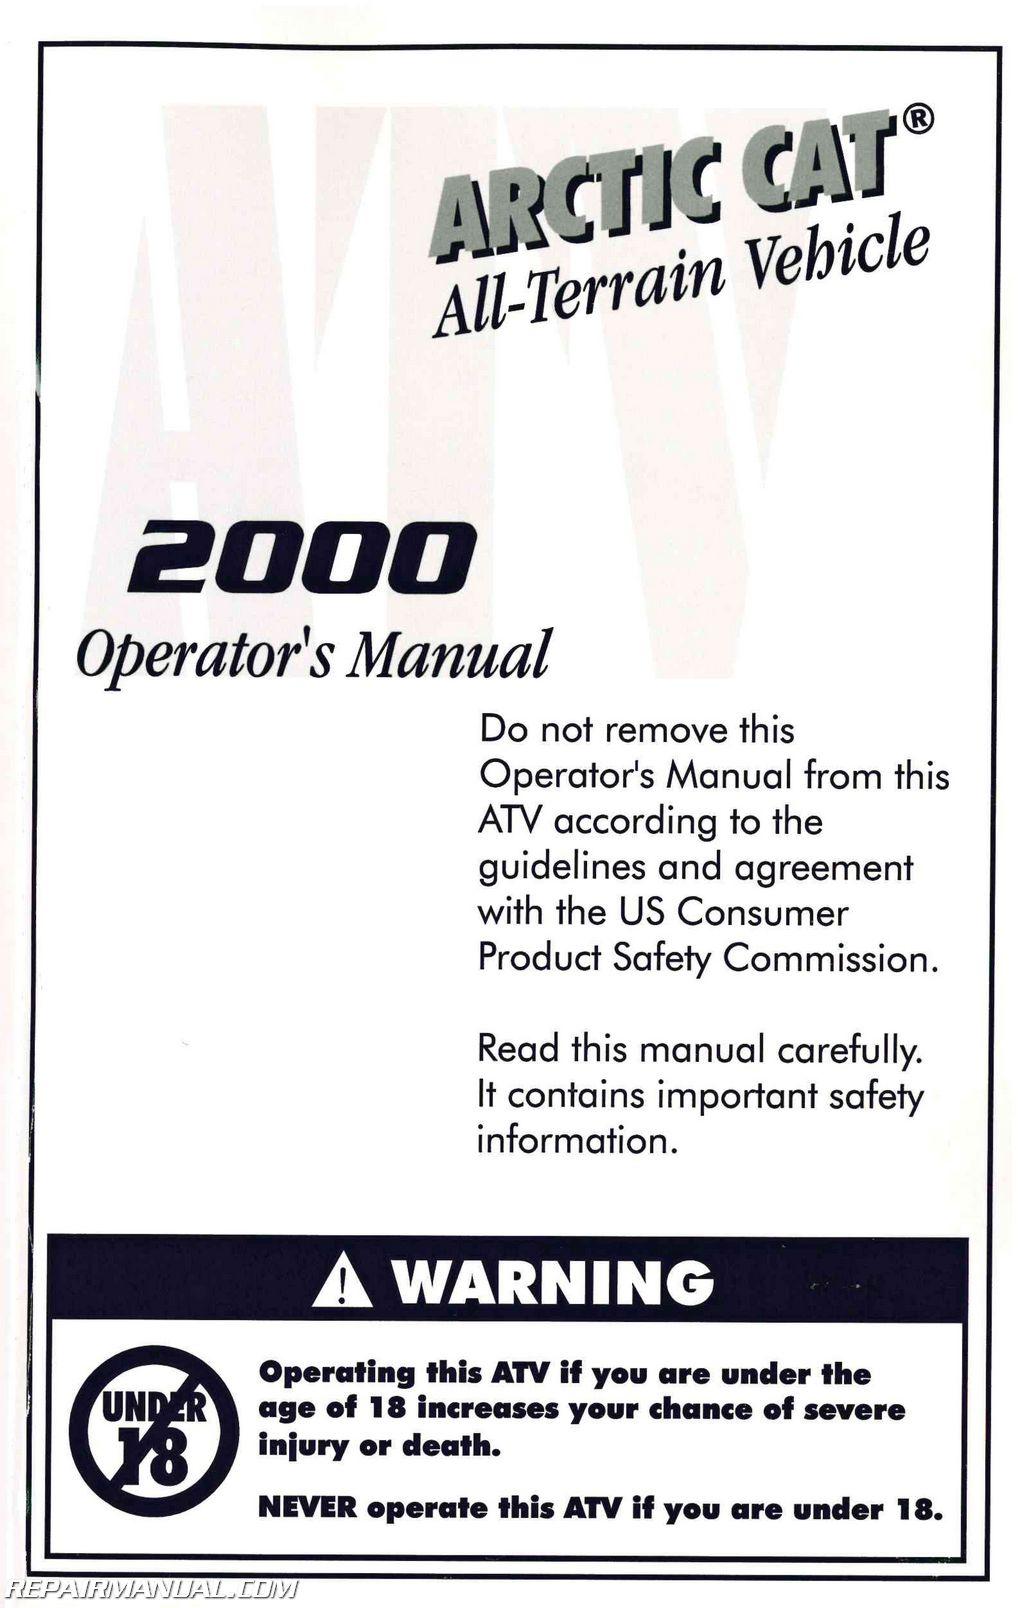 2000 arctic cat atv owners manual rh repairmanual com 2000 arctic cat atv owners manual 2000 arctic cat 500 atv owners manual